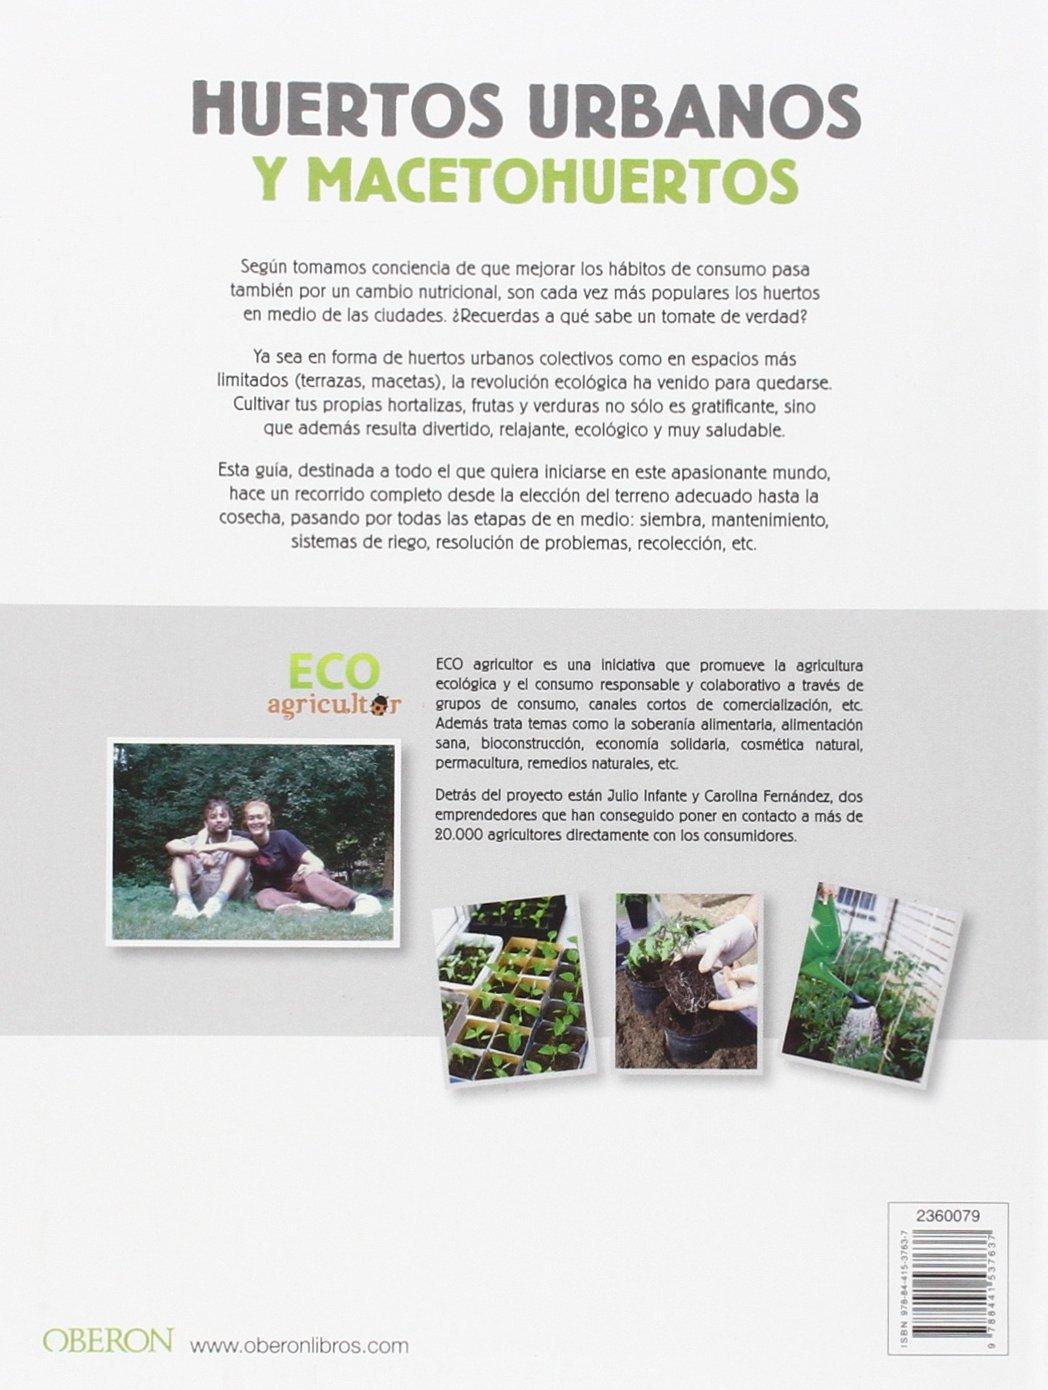 Huertos urbanos y macetohuertos: Carolina; Infante González, Julio Fernández: 9788441537637: Amazon.com: Books